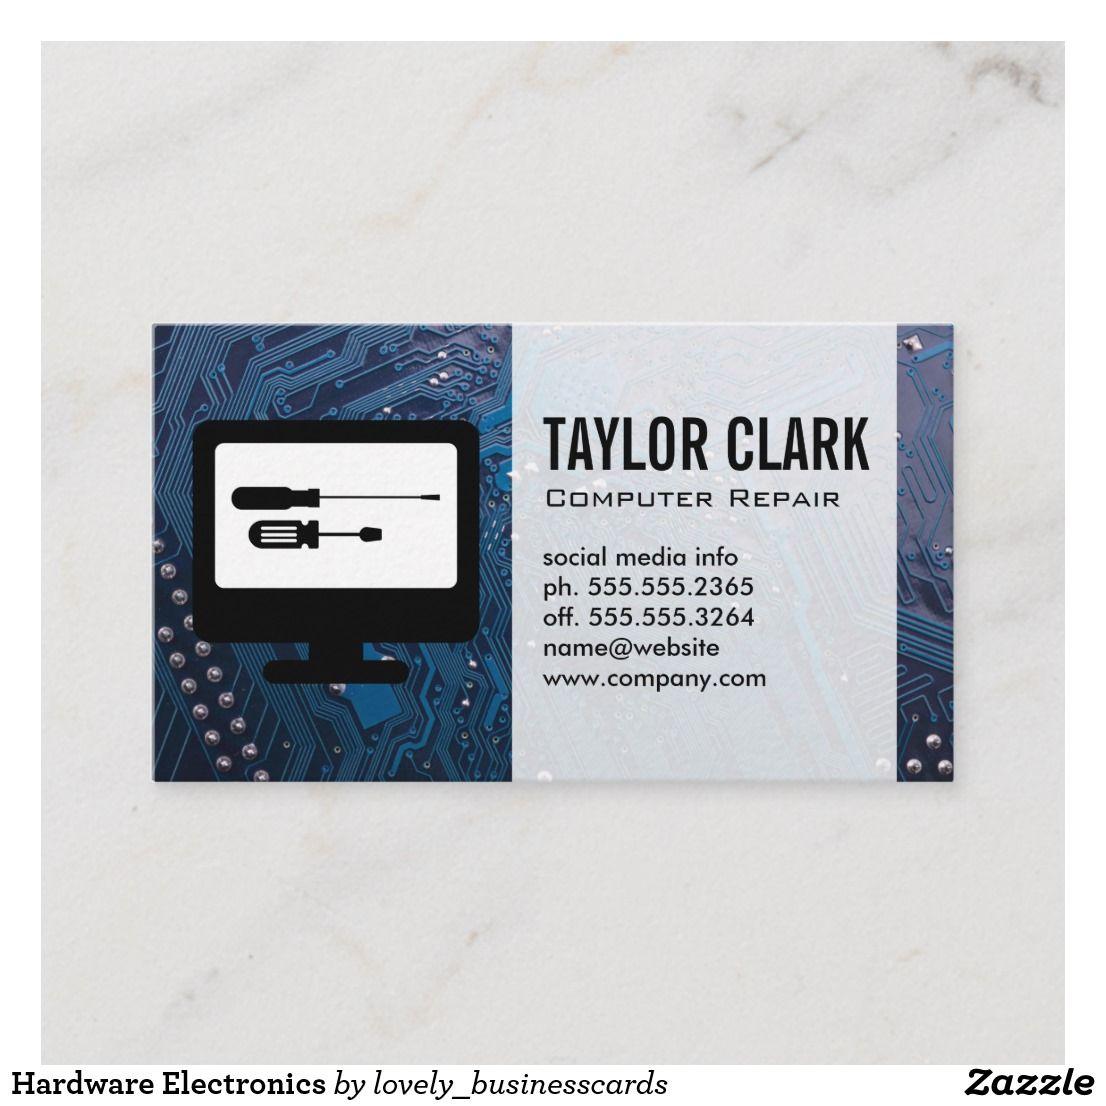 Hardware Electronics Business Card Zazzle Com Computer Repair Professional Business Cards Business Card Design